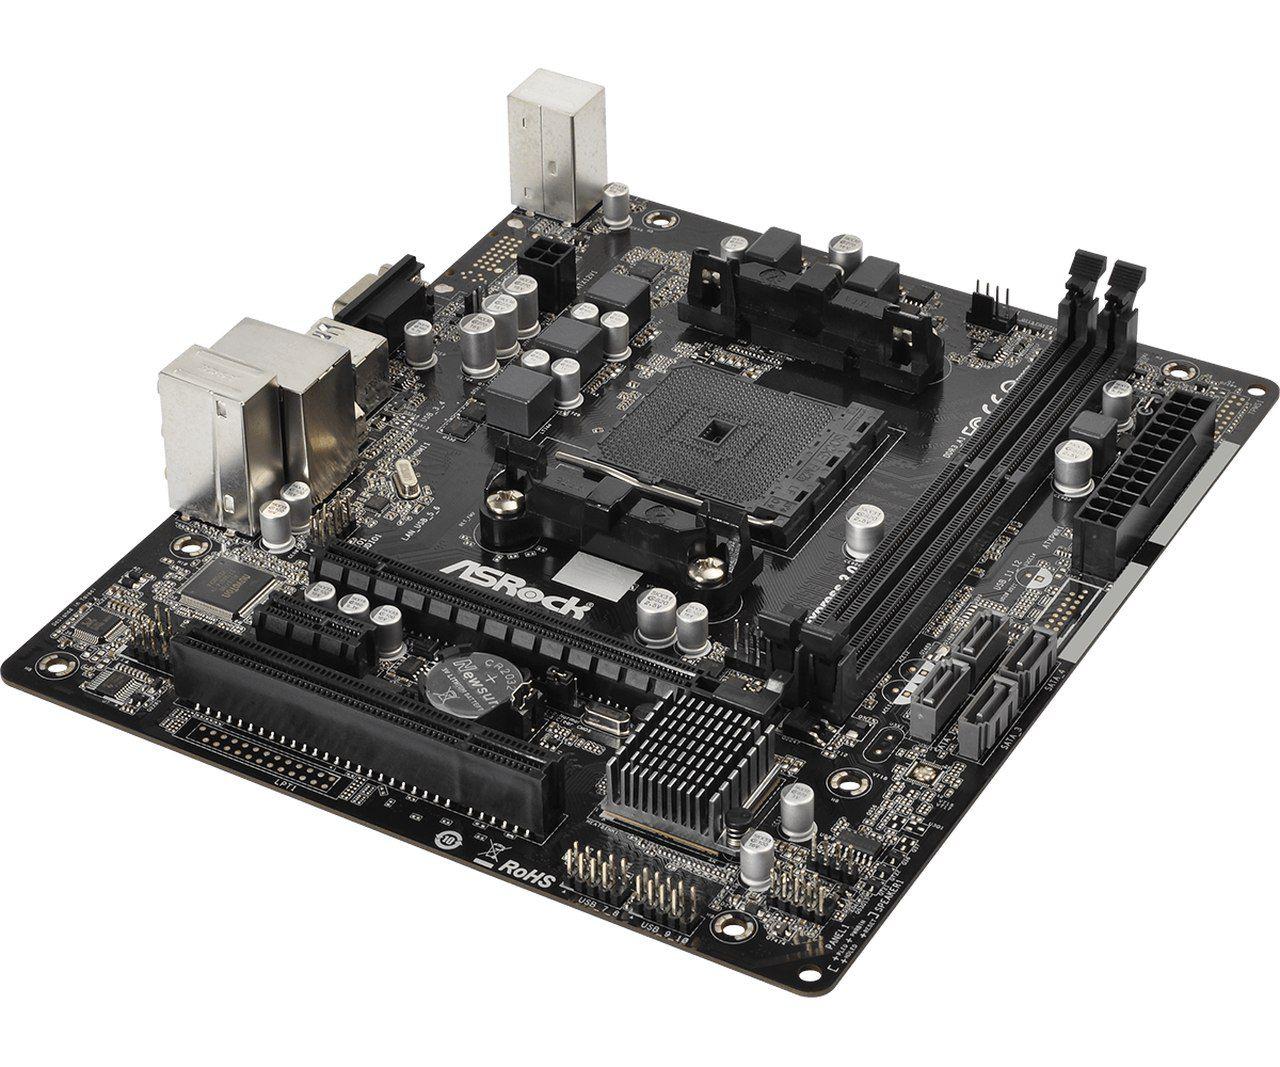 Placa Mãe ASRock FM2A68M-HD+ DDR3 Chipset AMD A68H FM2 FM2+